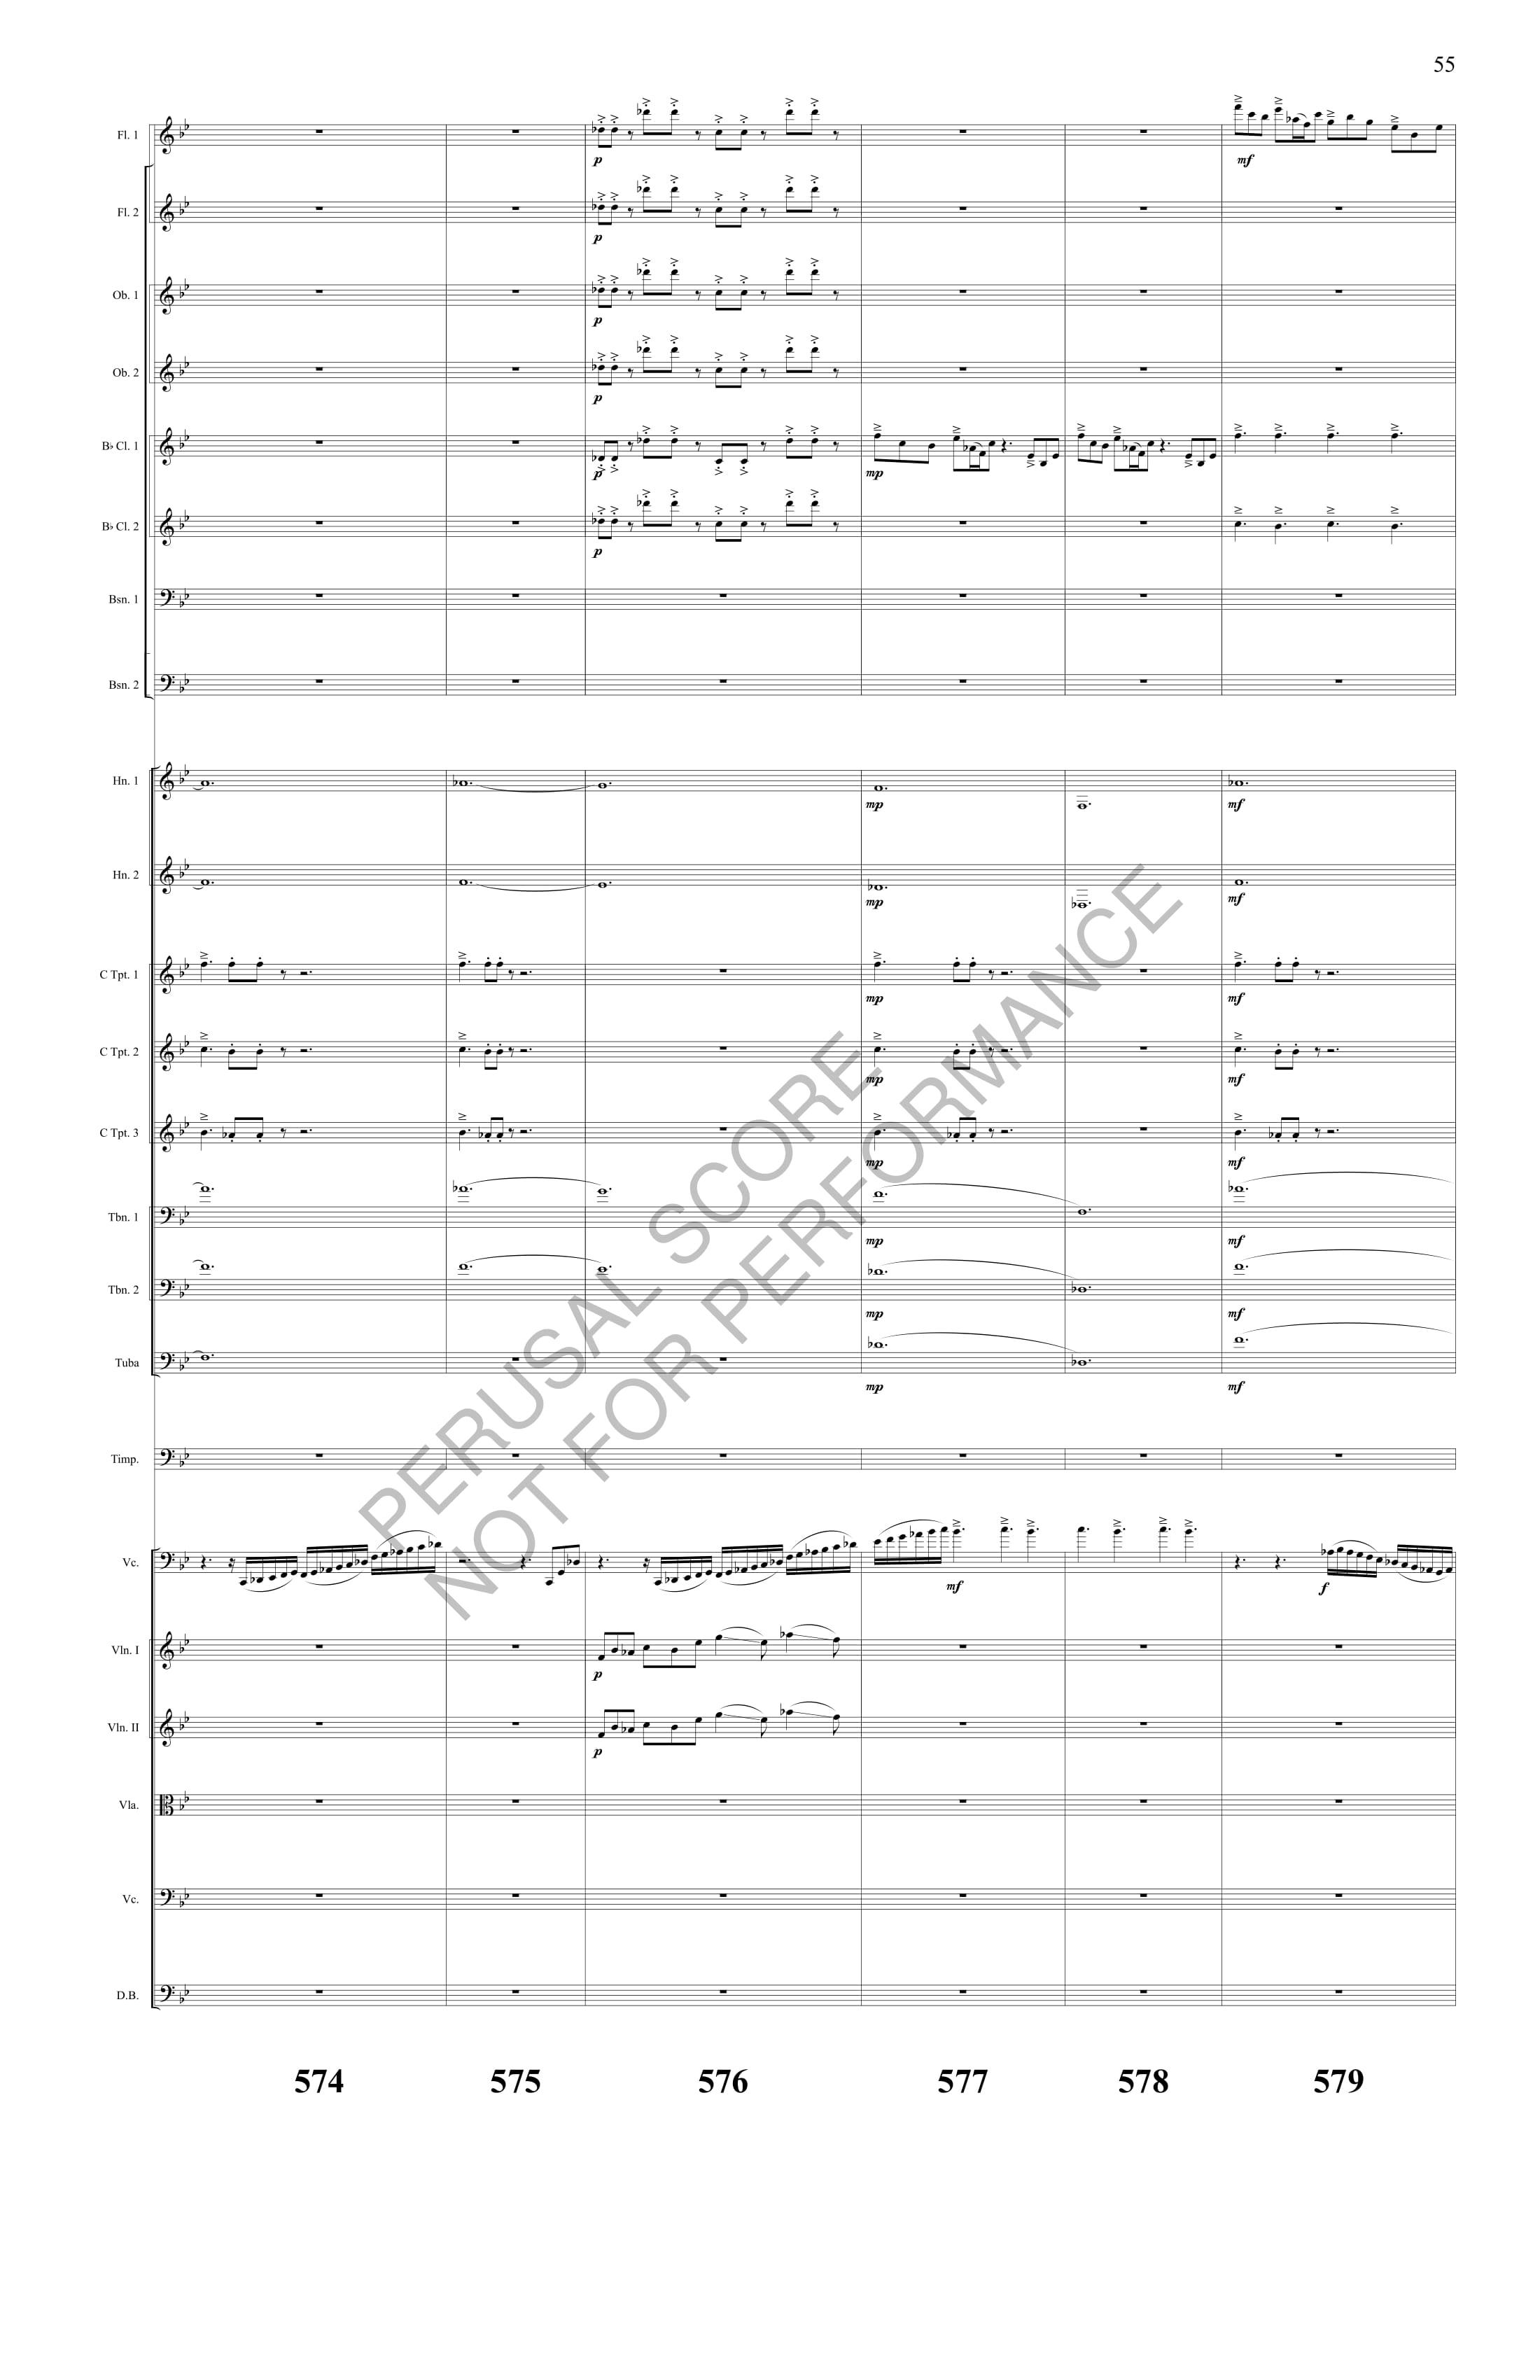 Boyd Tekton Score-watermark-61.jpg